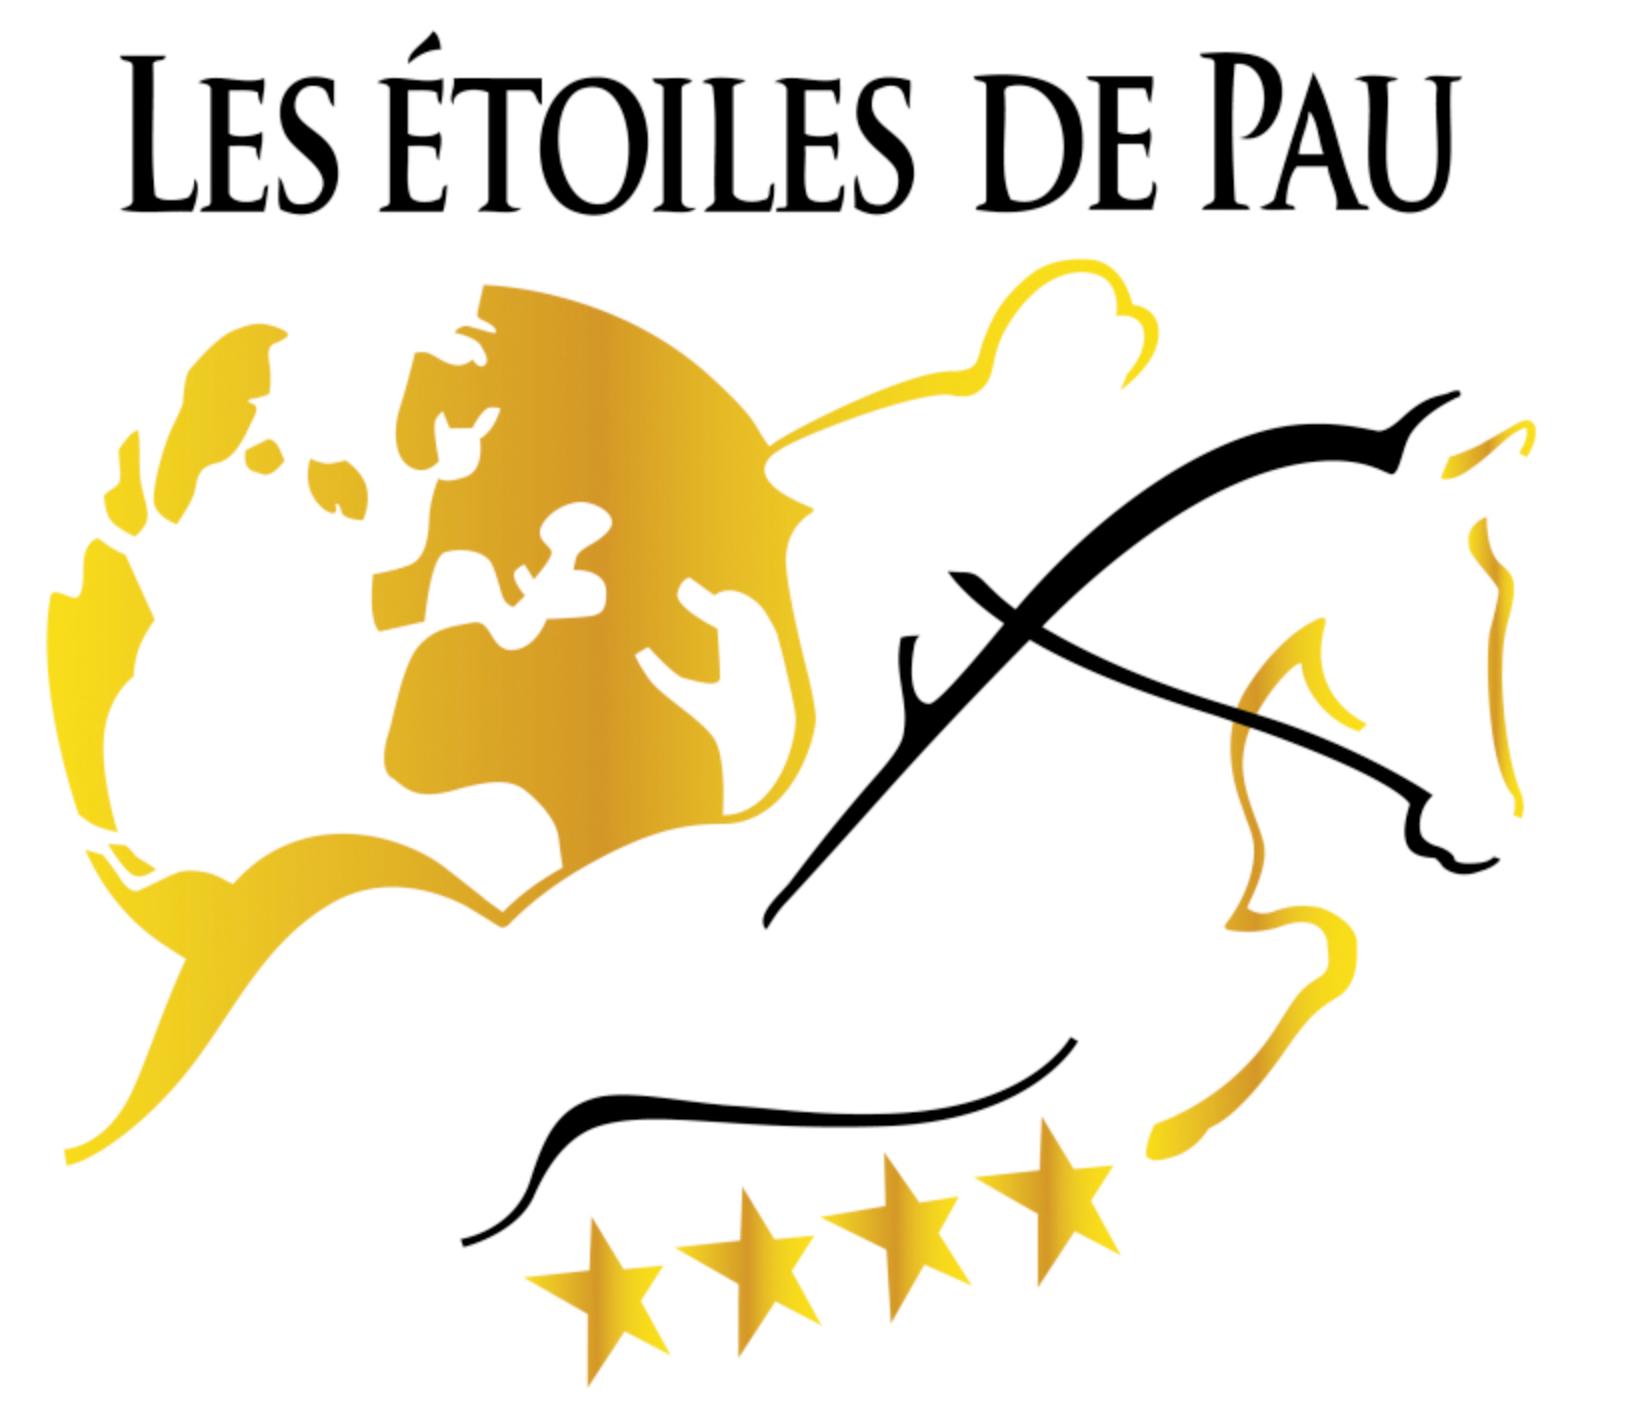 Les 5 Etoiles de Pau to run the CCI5*-L competition in October.